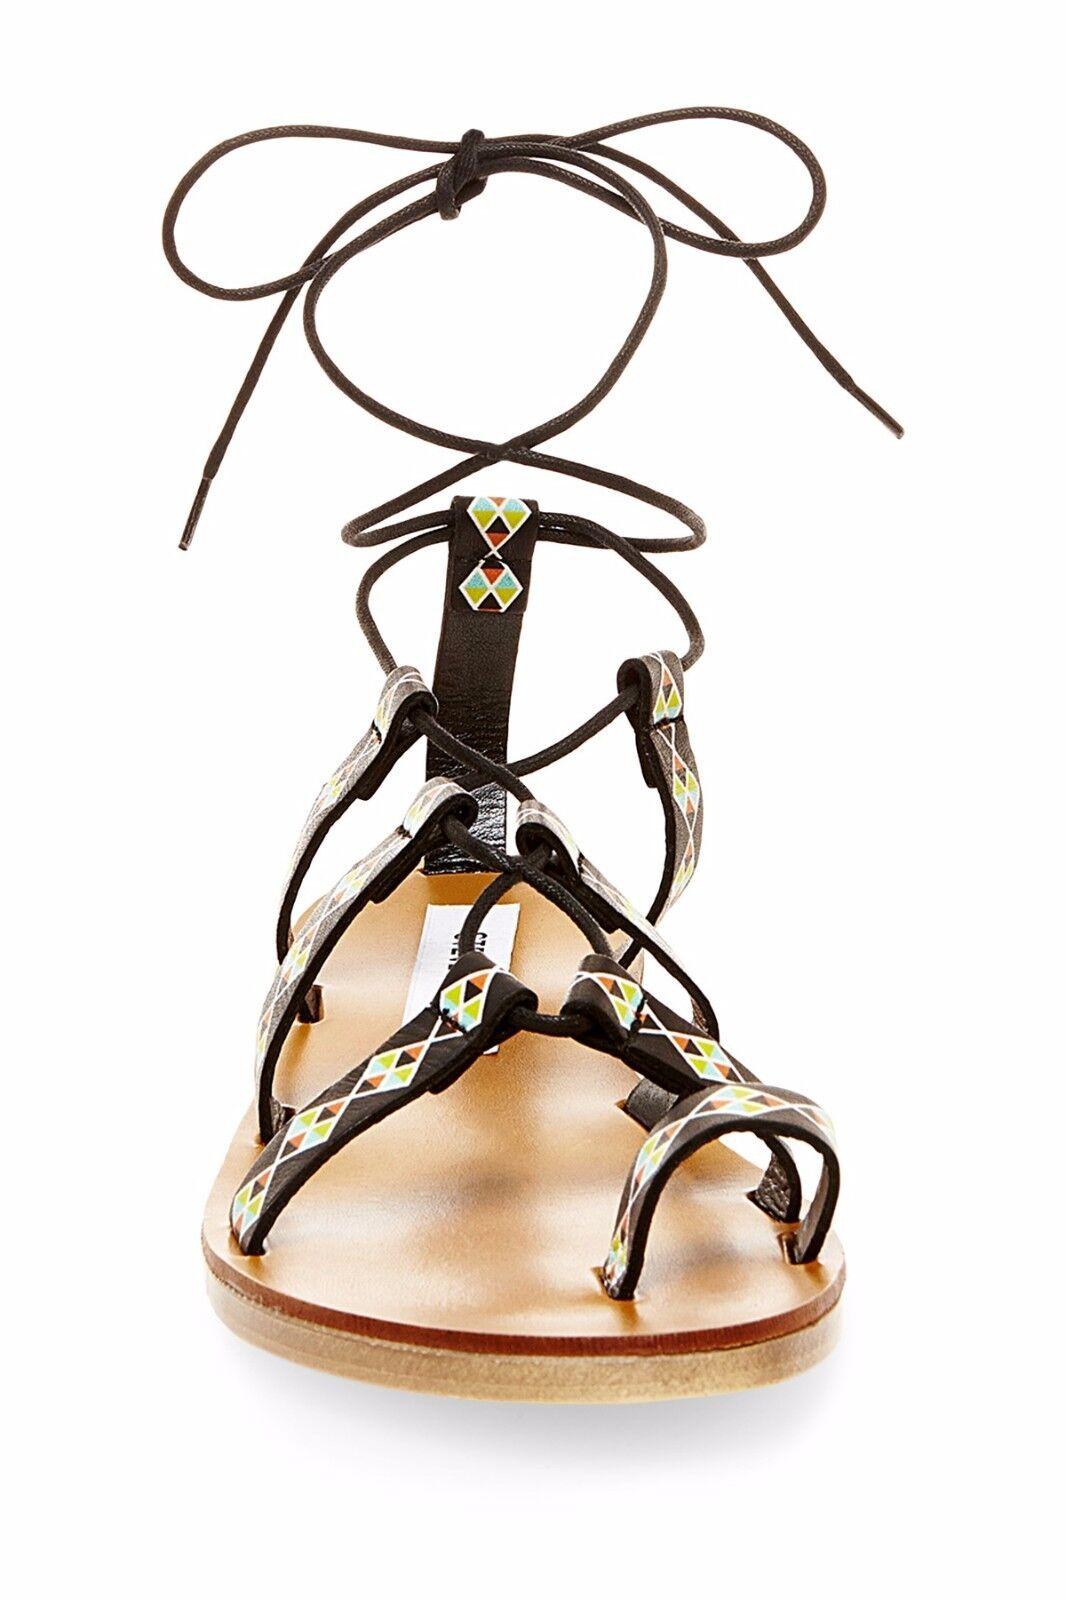 New Steve Madden Reeeta Strappy Sandal women's size 8